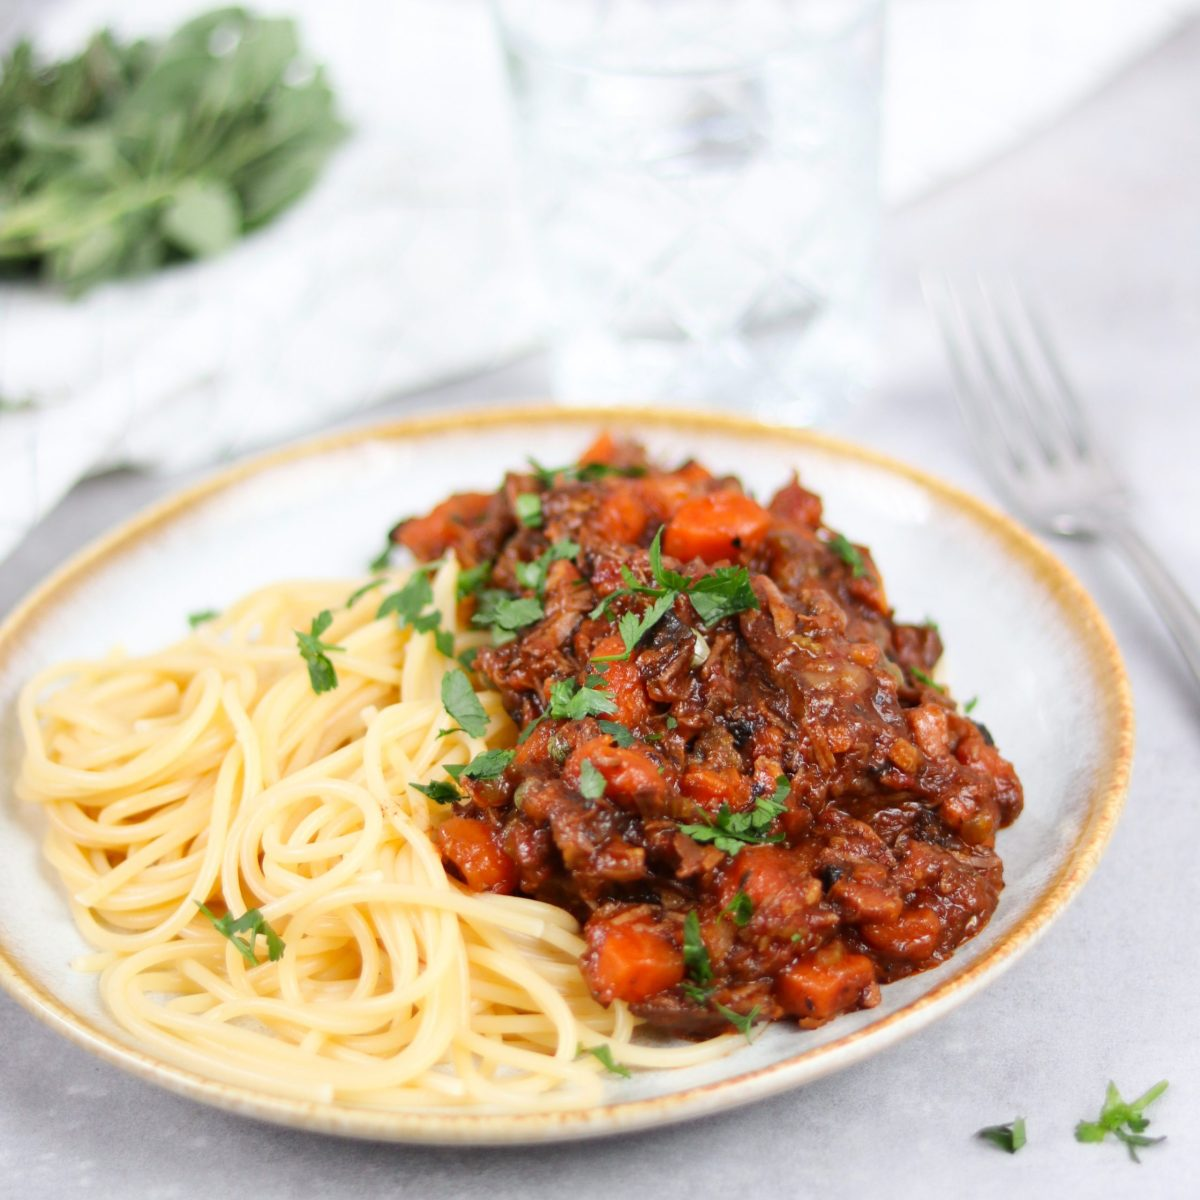 Spezzatino di manzo, Italiaans runderstoofvlees